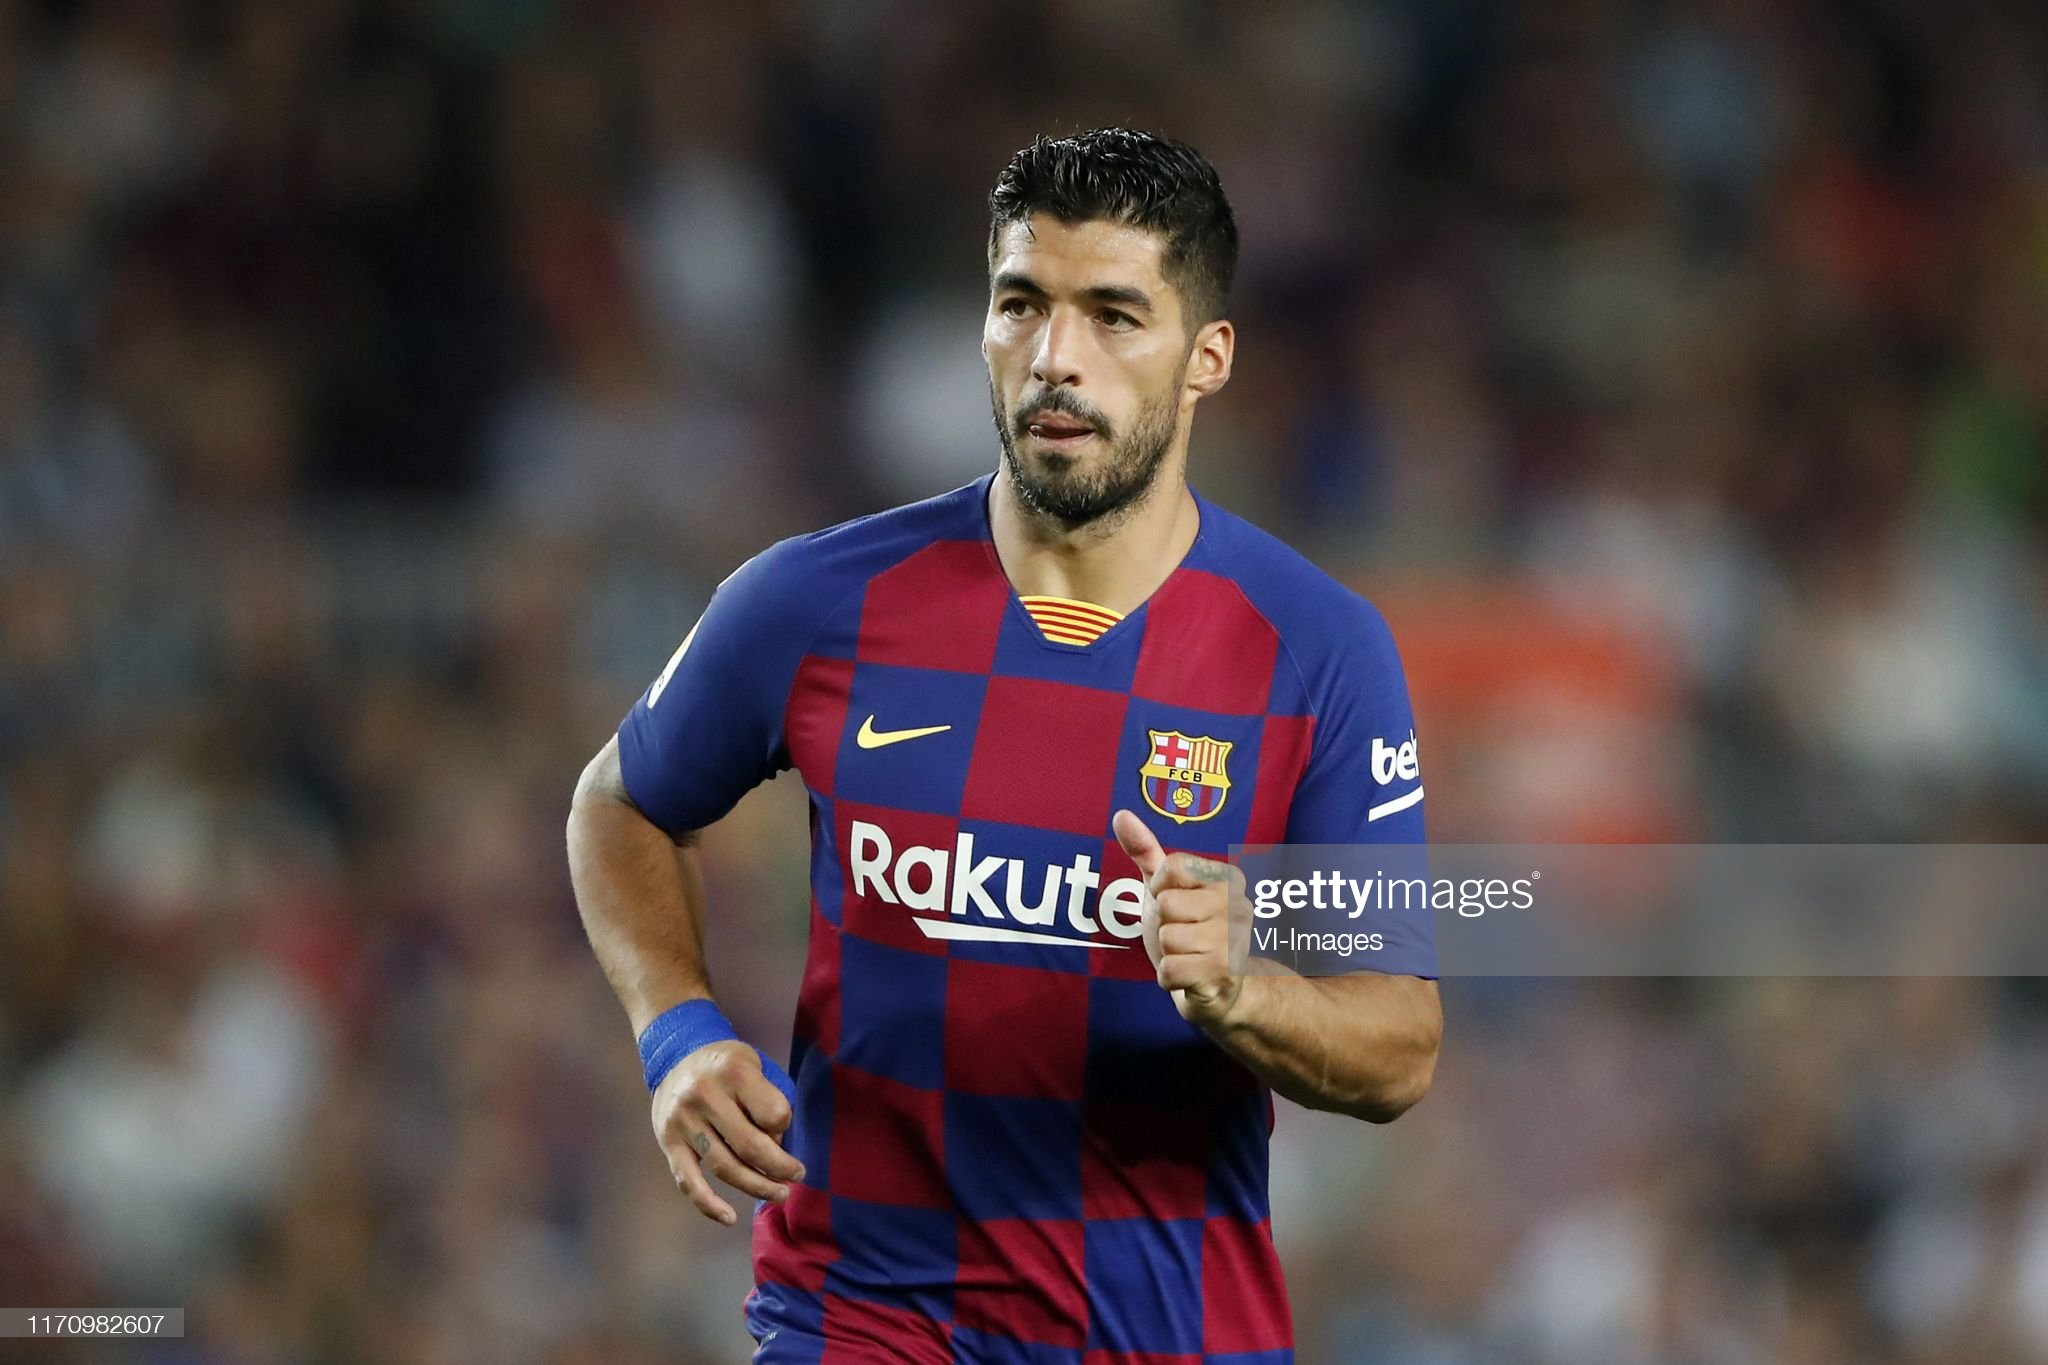 صور مباراة : برشلونة - فياريال 2-1 ( 24-09-2019 )  Luis-suarez-of-fc-barcelona-during-the-laliga-santander-match-between-picture-id1170982607?s=2048x2048